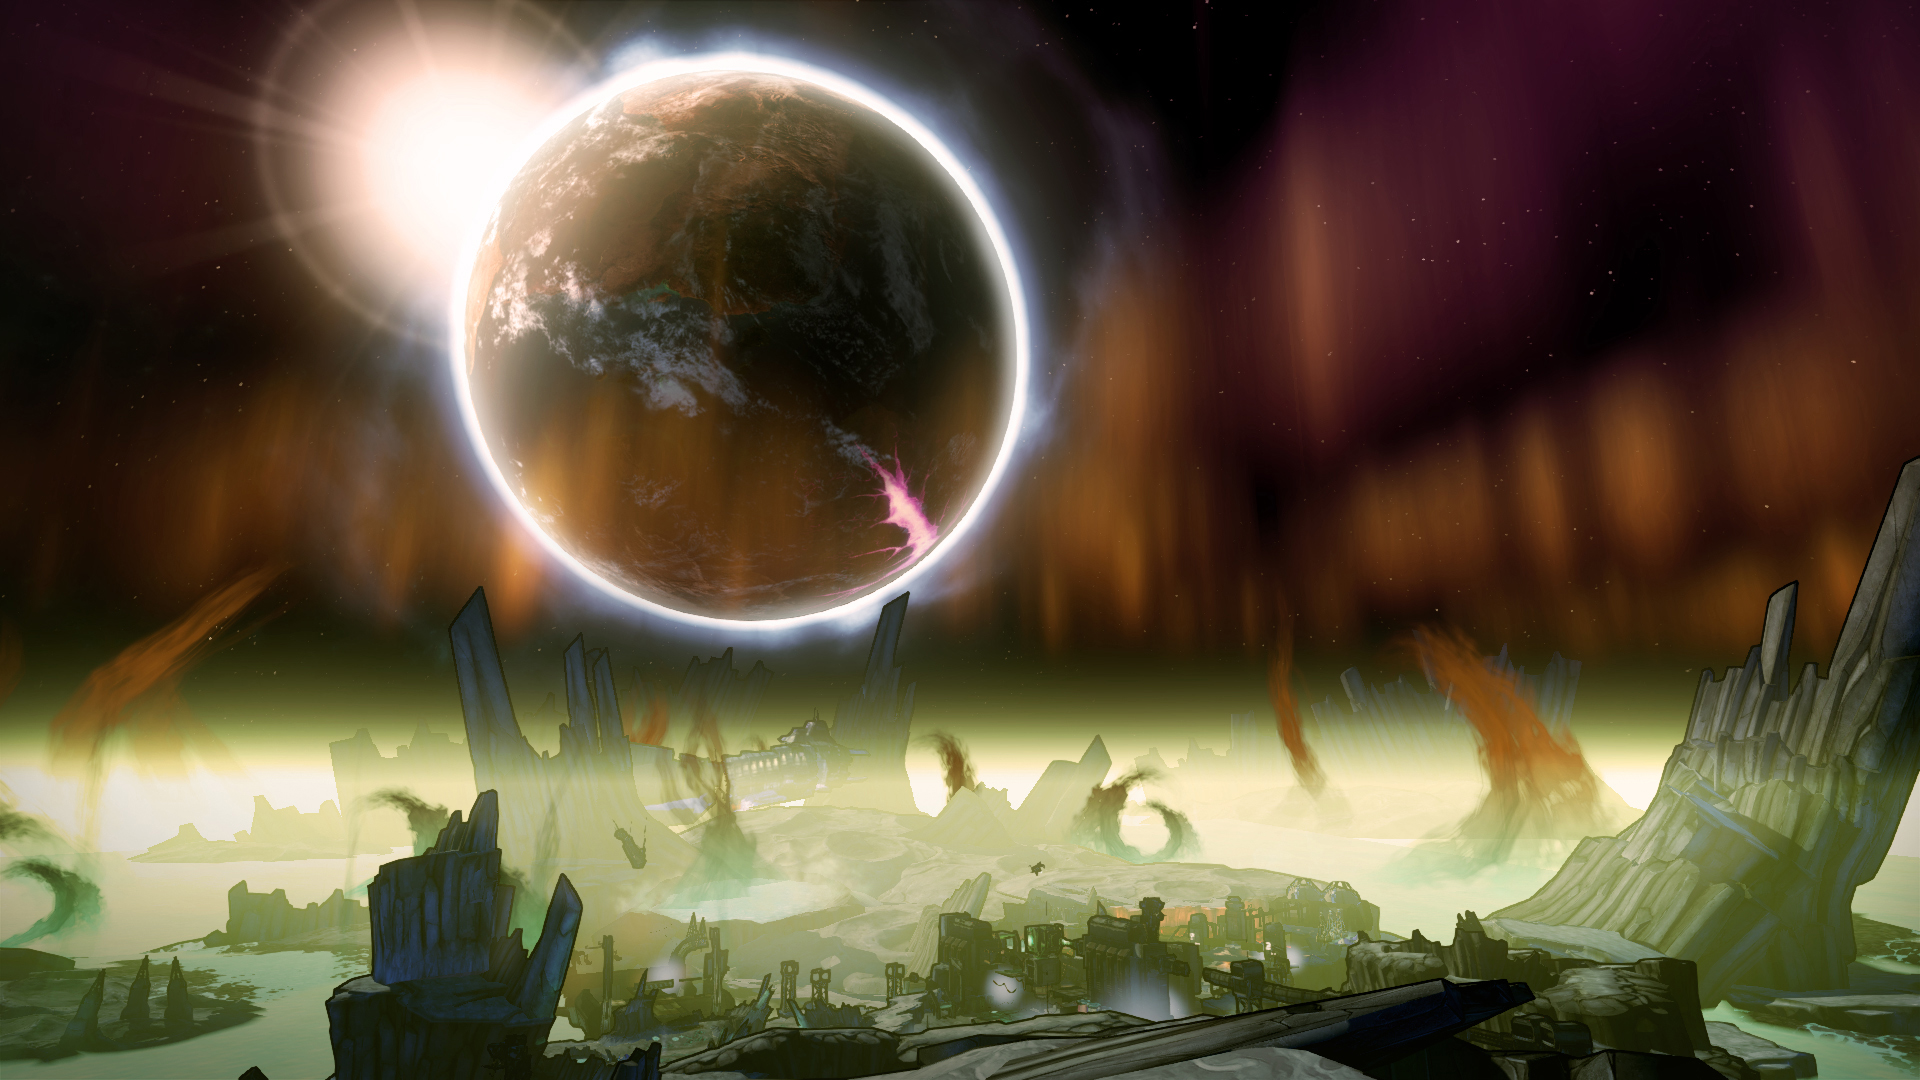 Borderlands: The Pre-Sequel! - Nisha the Lawbringer